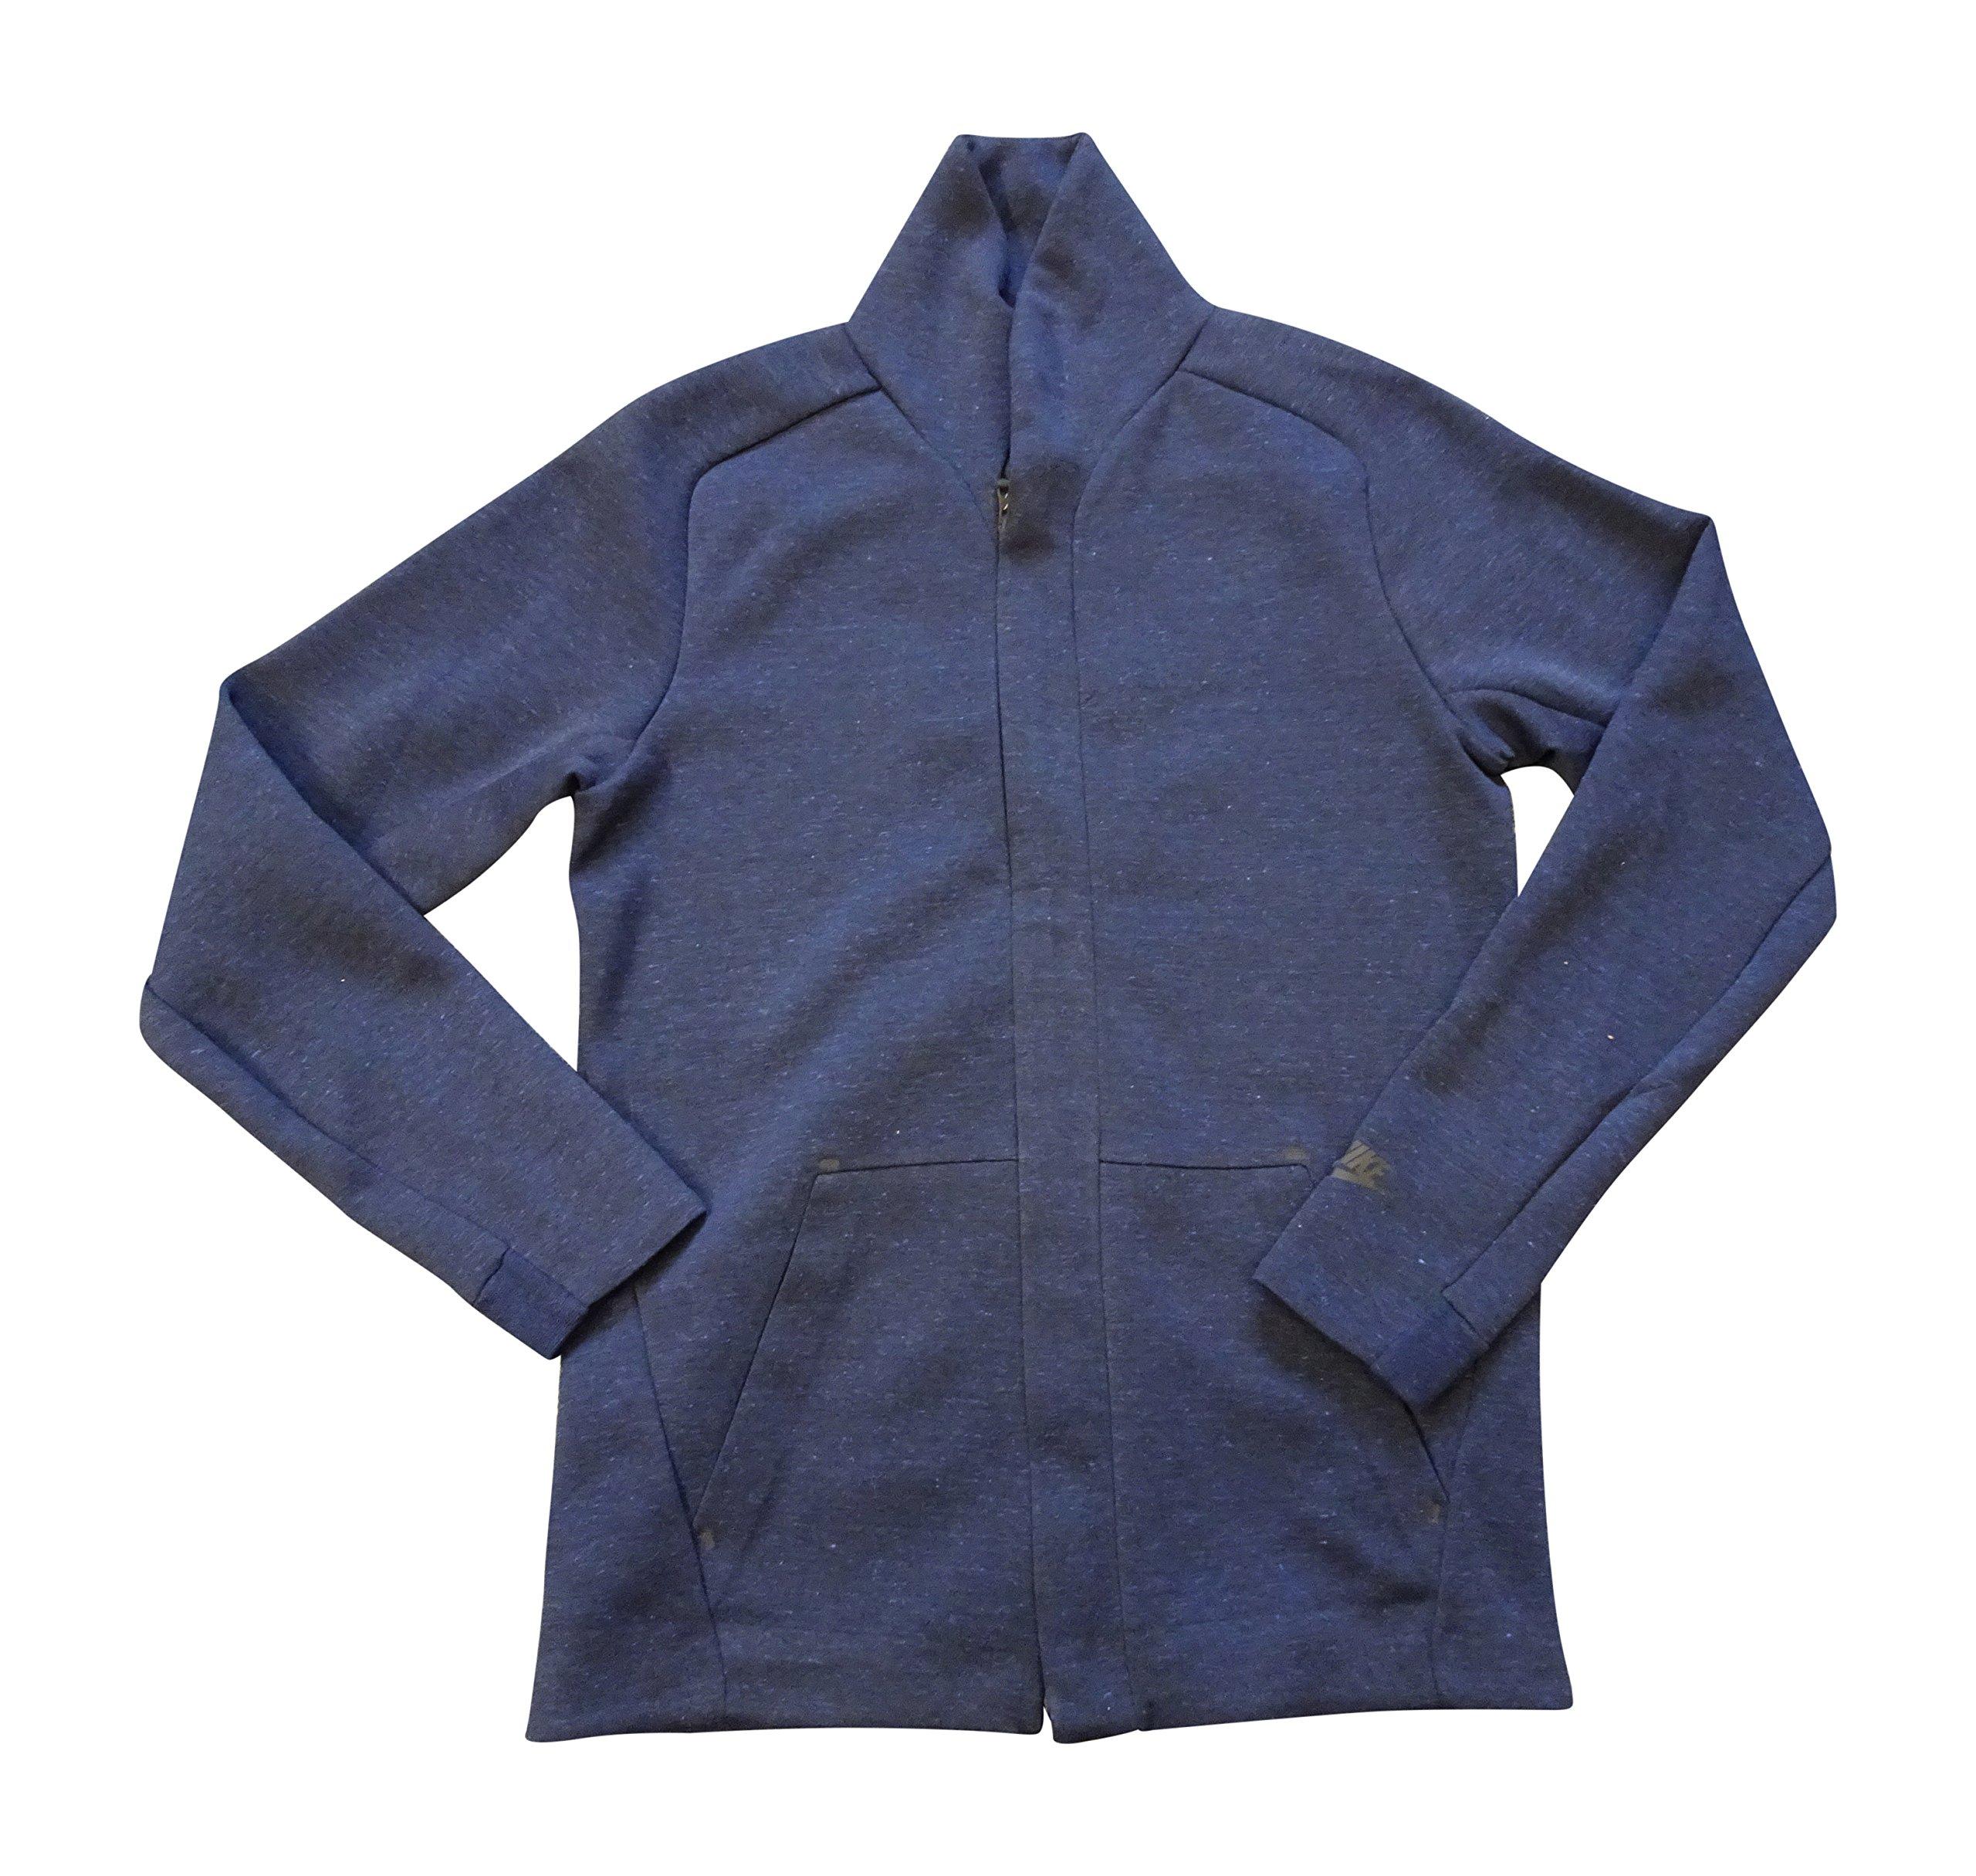 NIKE Mens NSW Tech Fit Fleece Jacket 805164 Jumper (Medium, Navy blue 473)